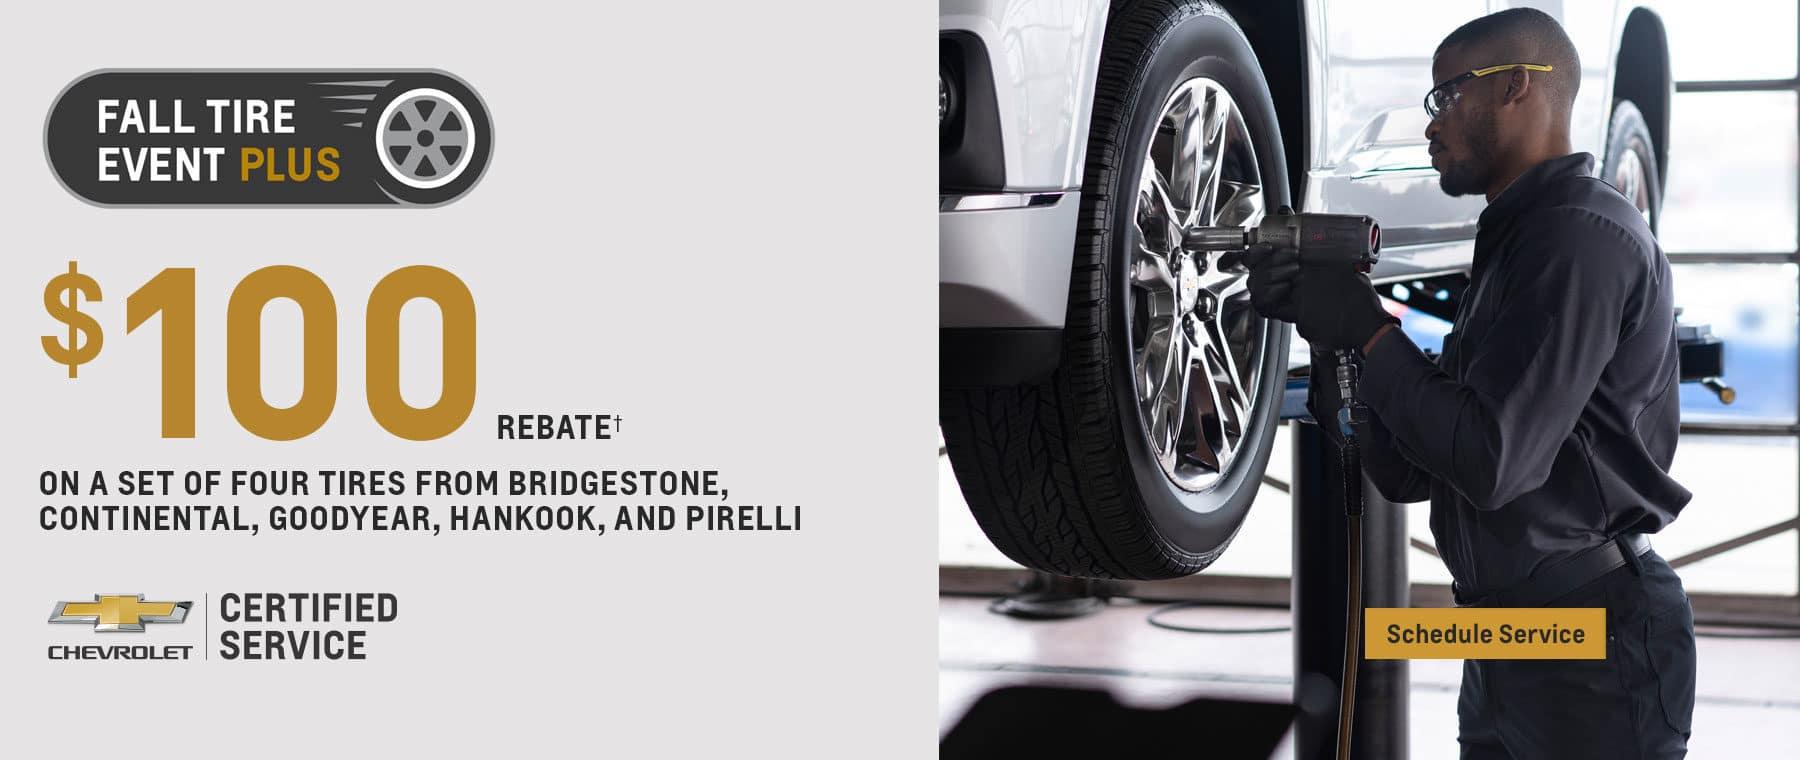 Tire Rebate Offer – Desktop